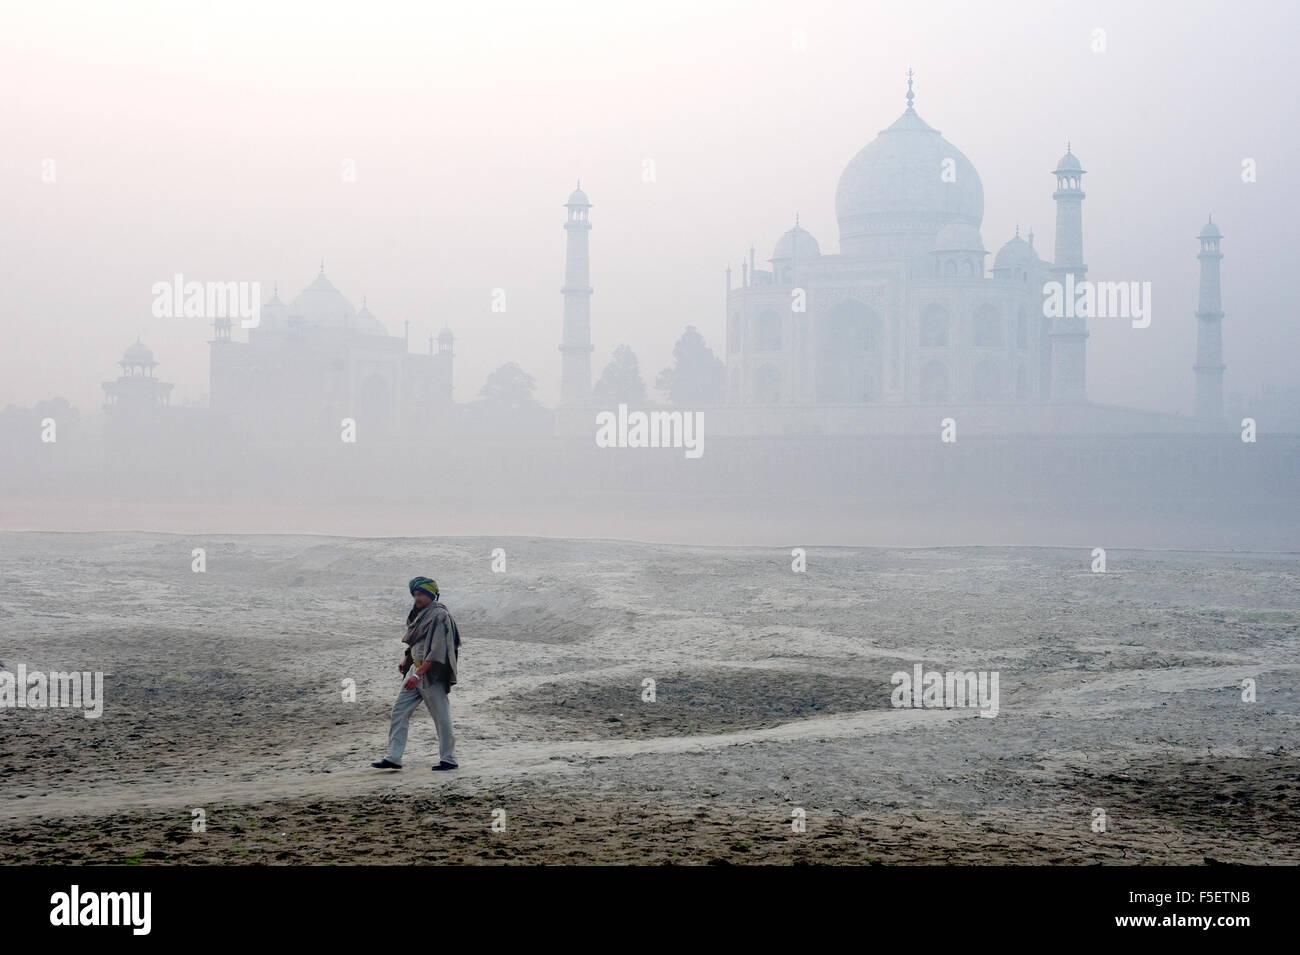 Taj Mahal guard camina sobre los bancos del río Yamuna. Imagen De Stock